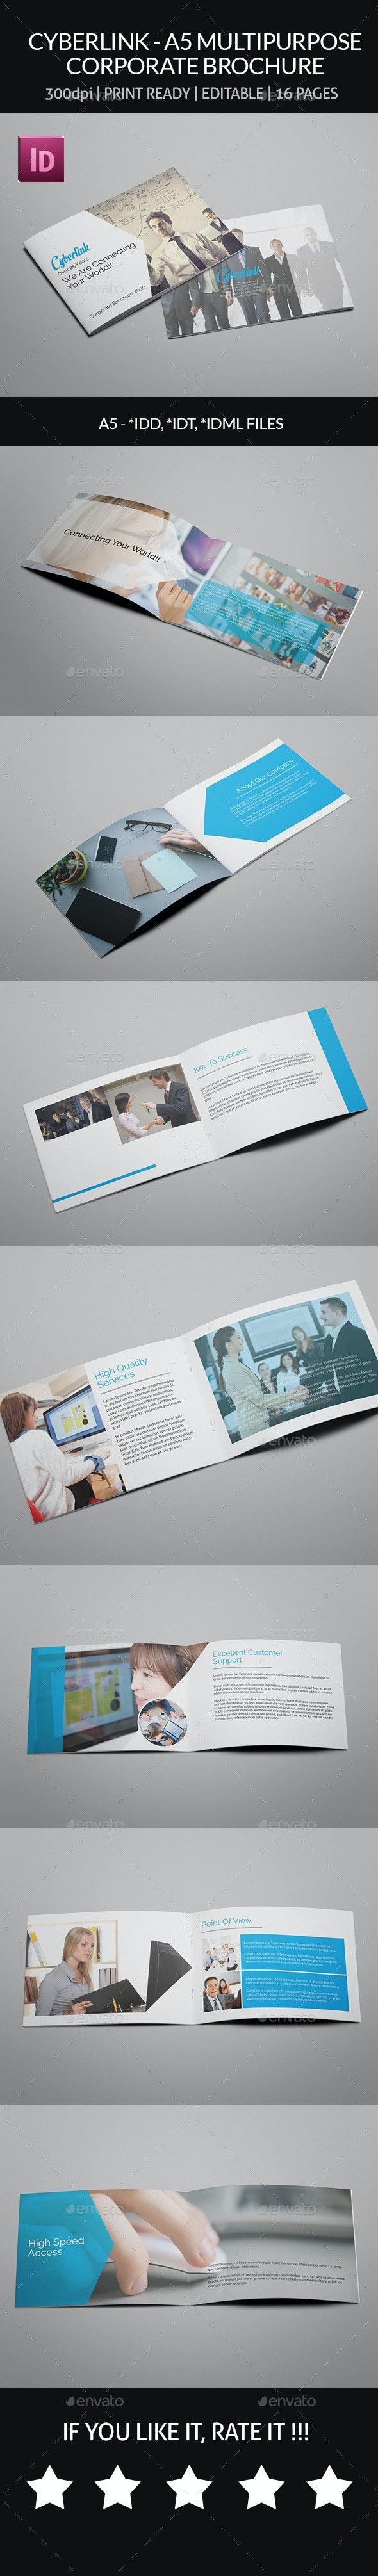 Cyberlink - A5 Multipurpose Corporate Brochure - Corporate Brochures